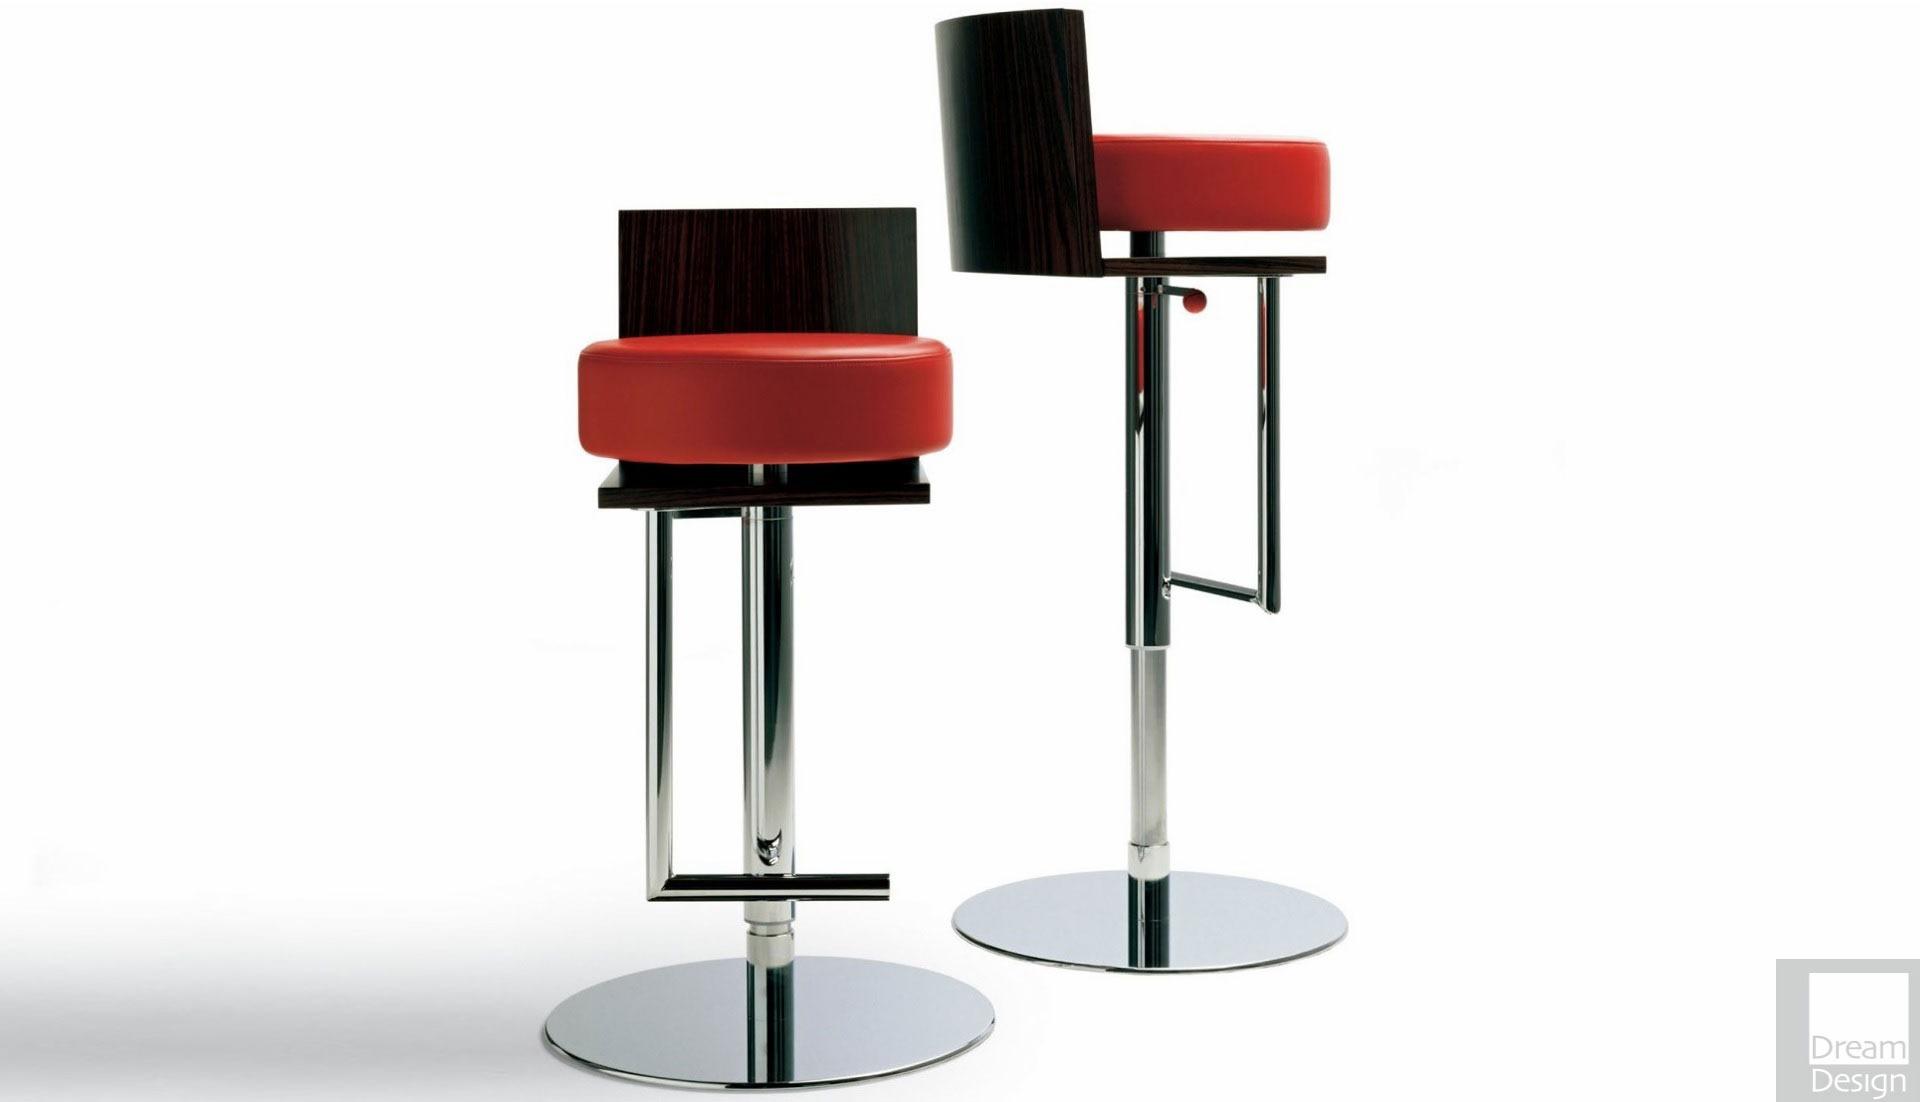 Poltrona Frau Le Spighe Bar Stool Dream Design Interiors Ltd : Poltrona frau Le Spighe bar stool 08 from dreamdesign.co.uk size 1920 x 1102 jpeg 82kB